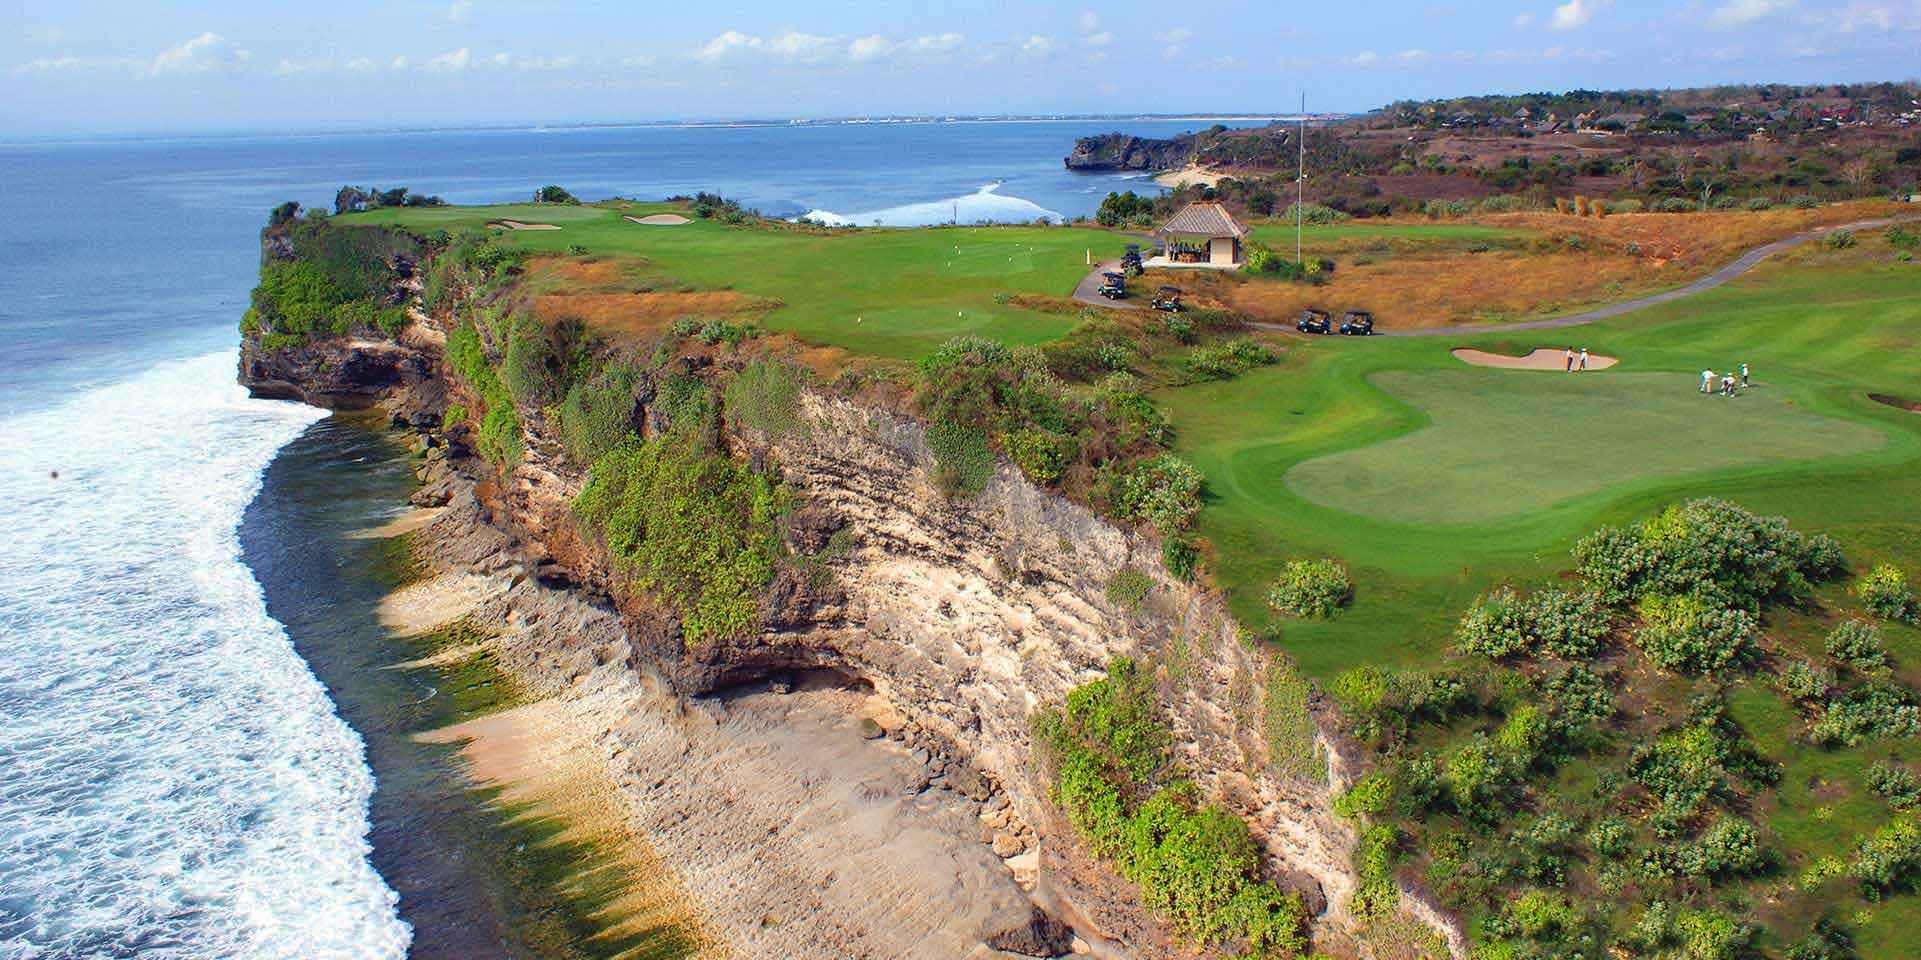 Manfaat lain golf